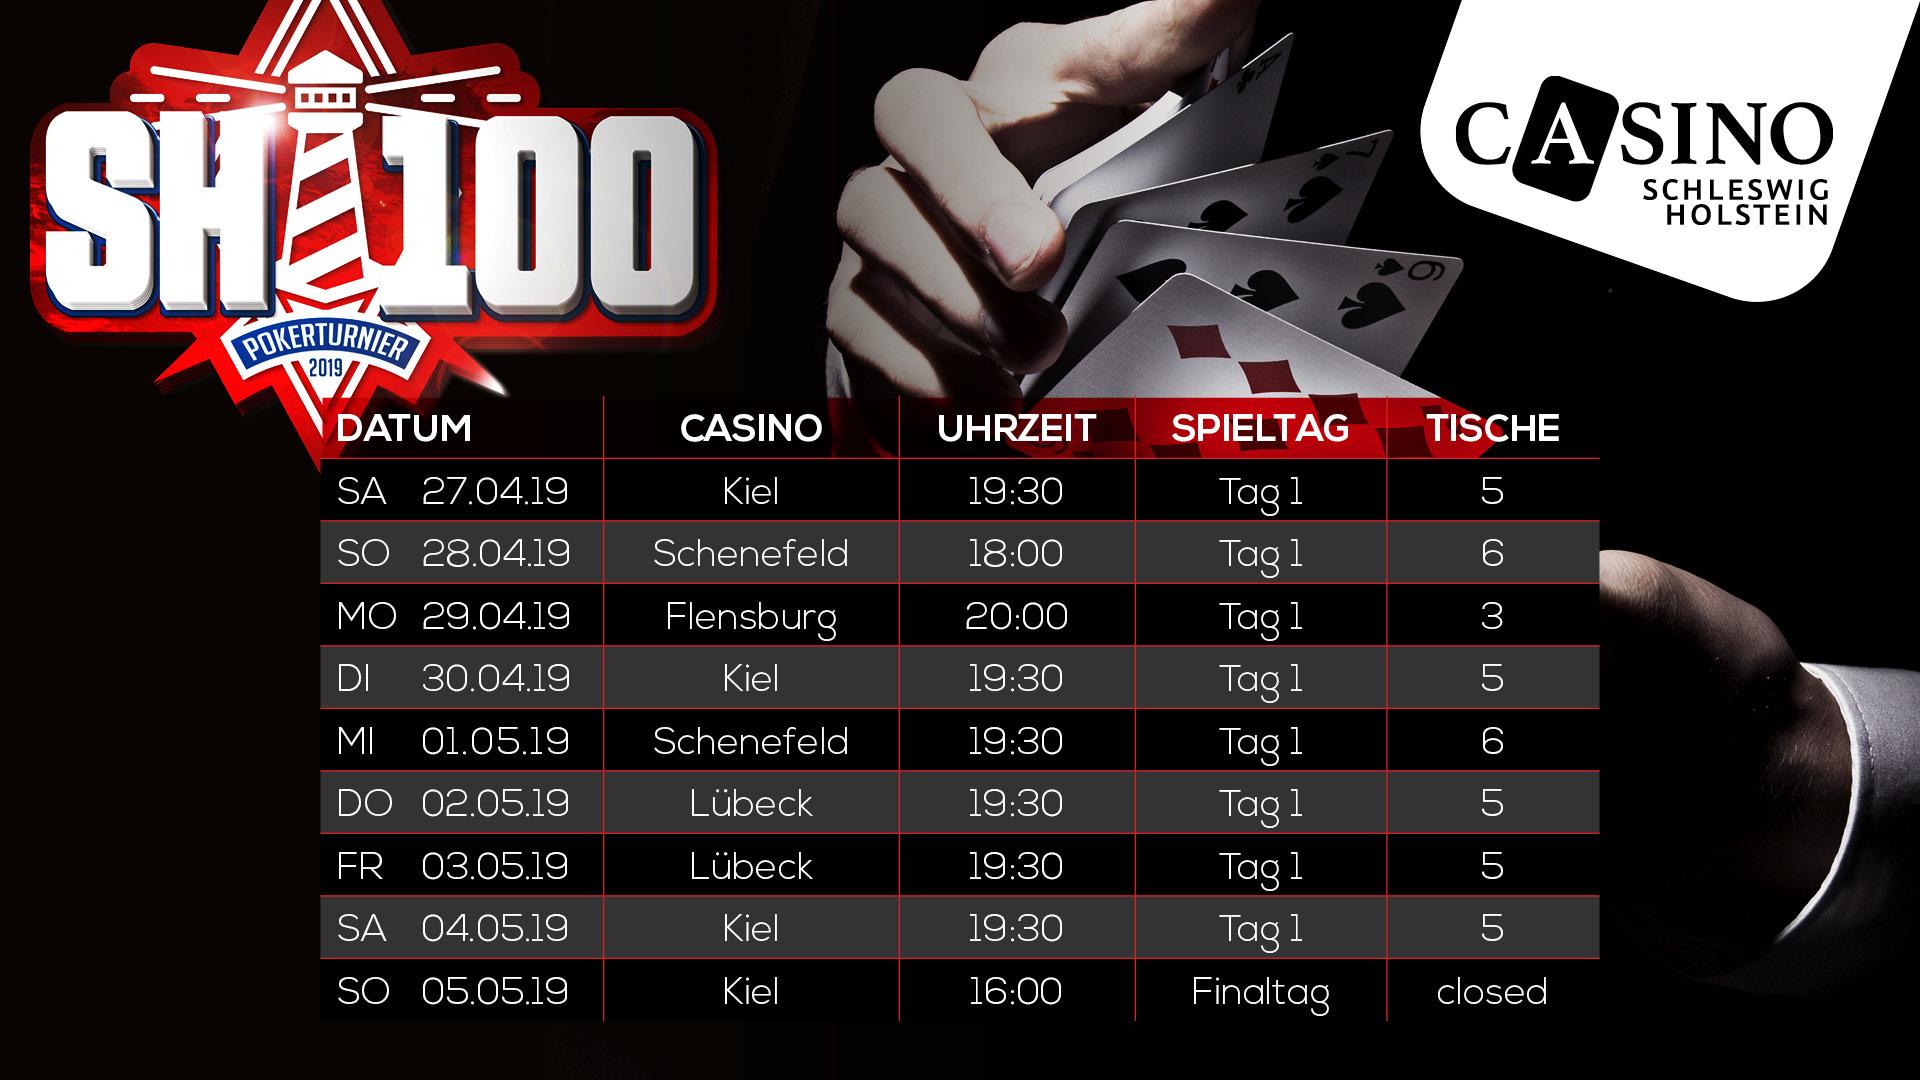 Casino_SH_SH_100_2019_1920x1080px_v05_RZ_Schedule